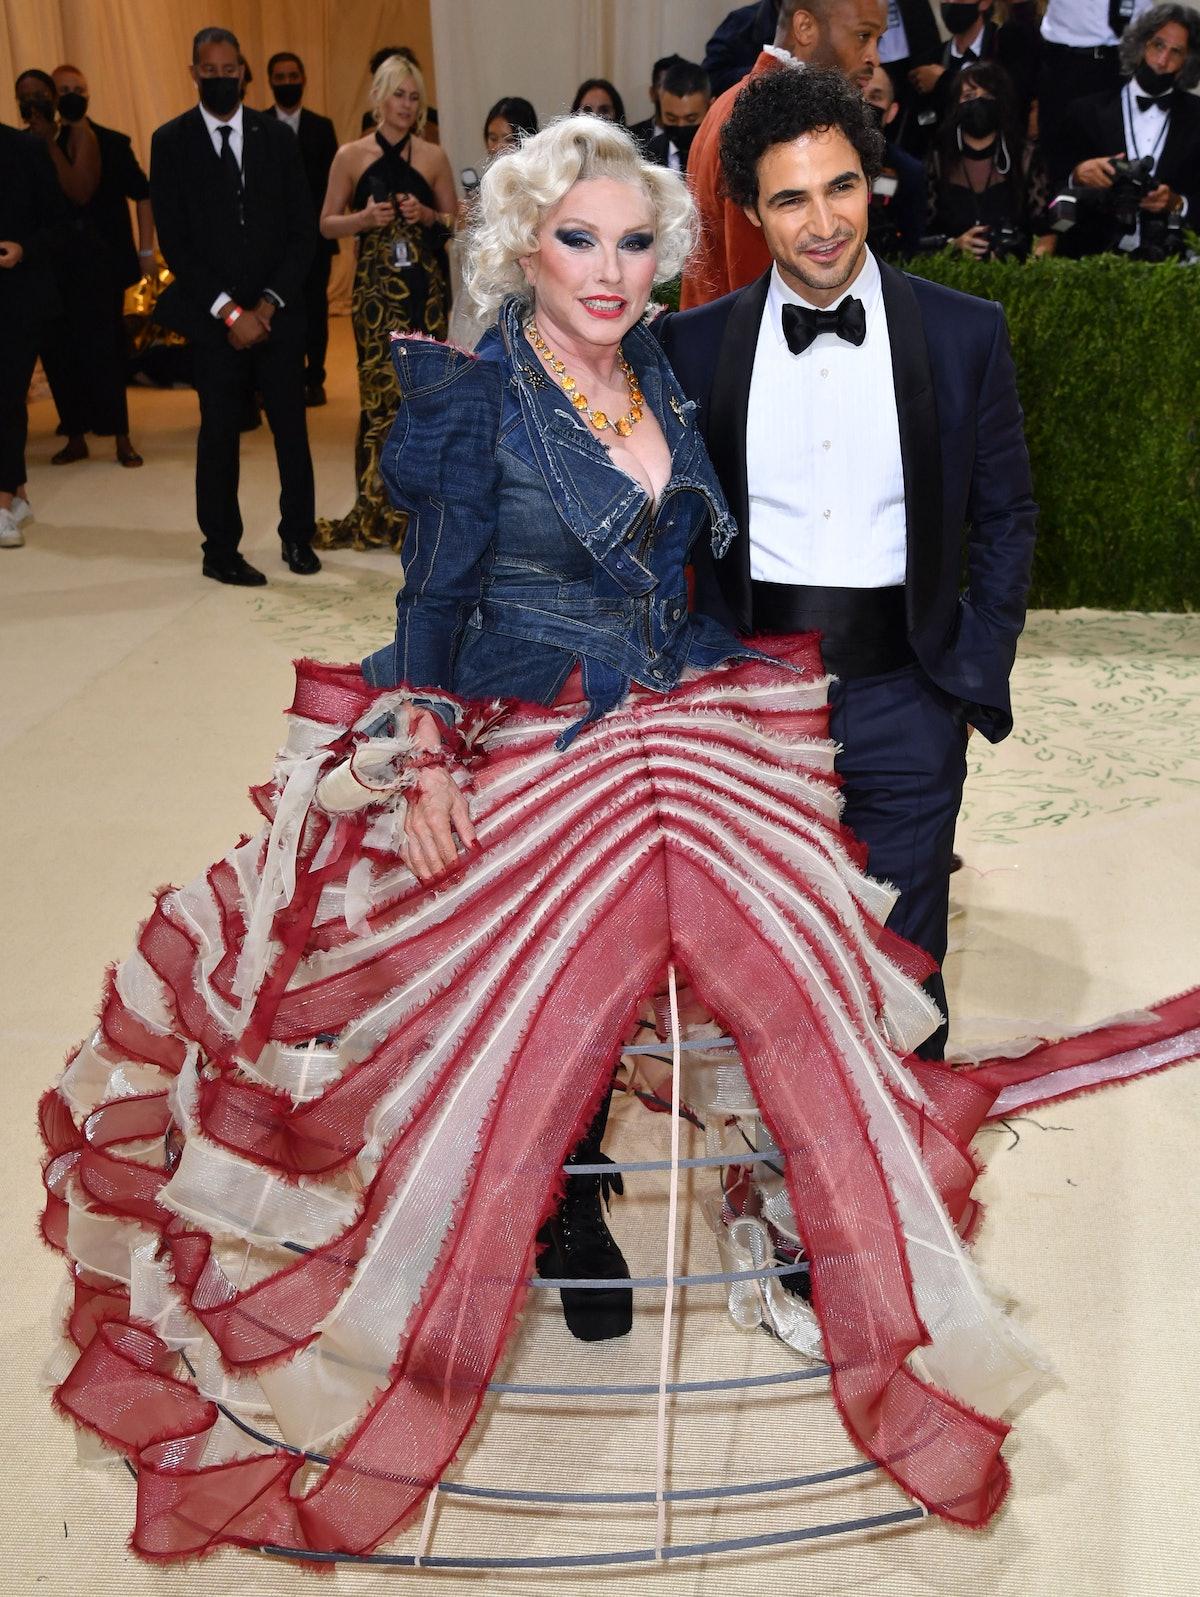 US singer Debbie Harry (L) and designer Zac Posen arrive for the 2021 Met Gala at the Metropolitan M...